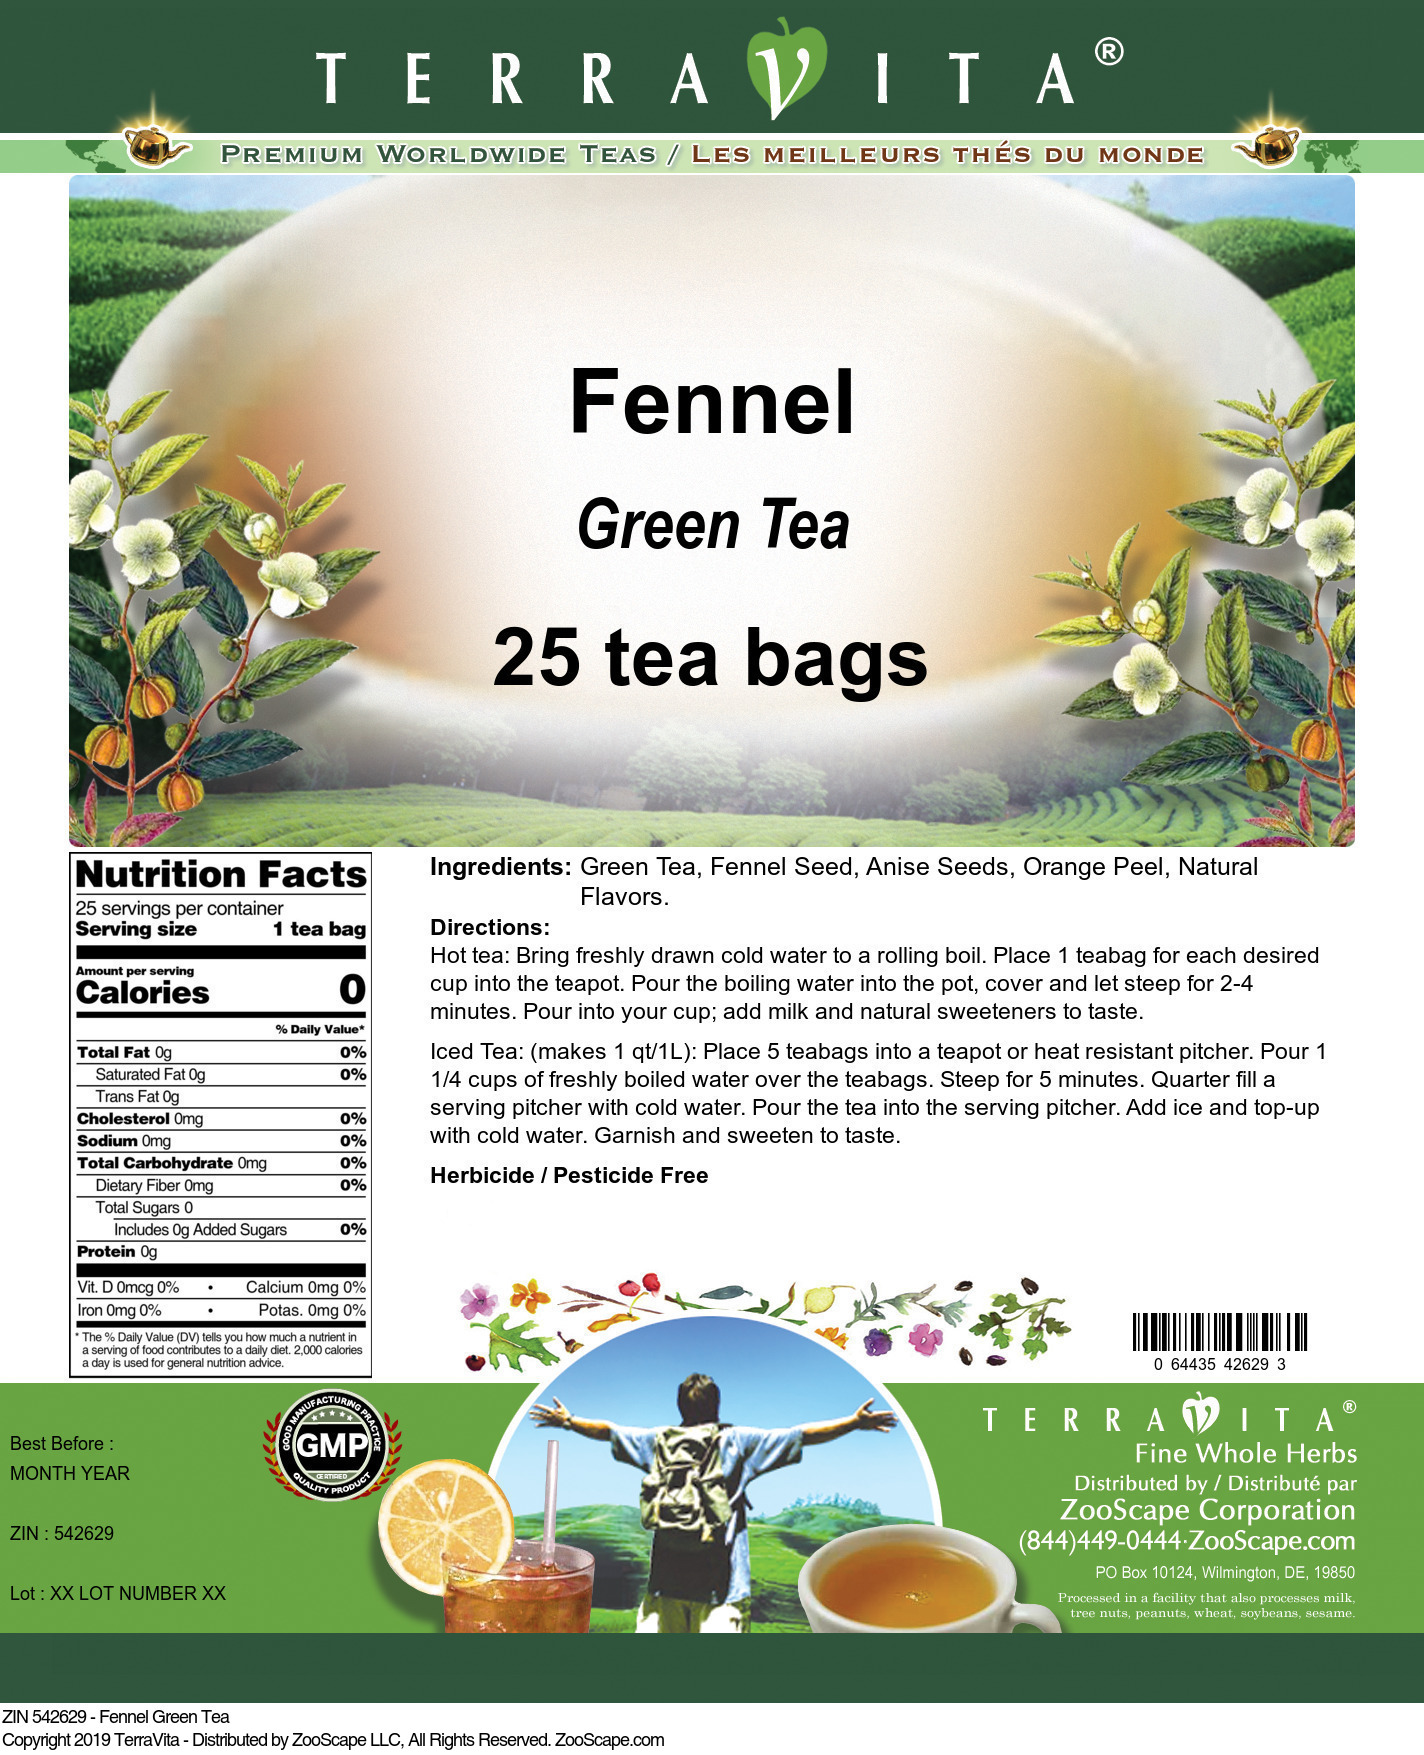 Fennel Green Tea